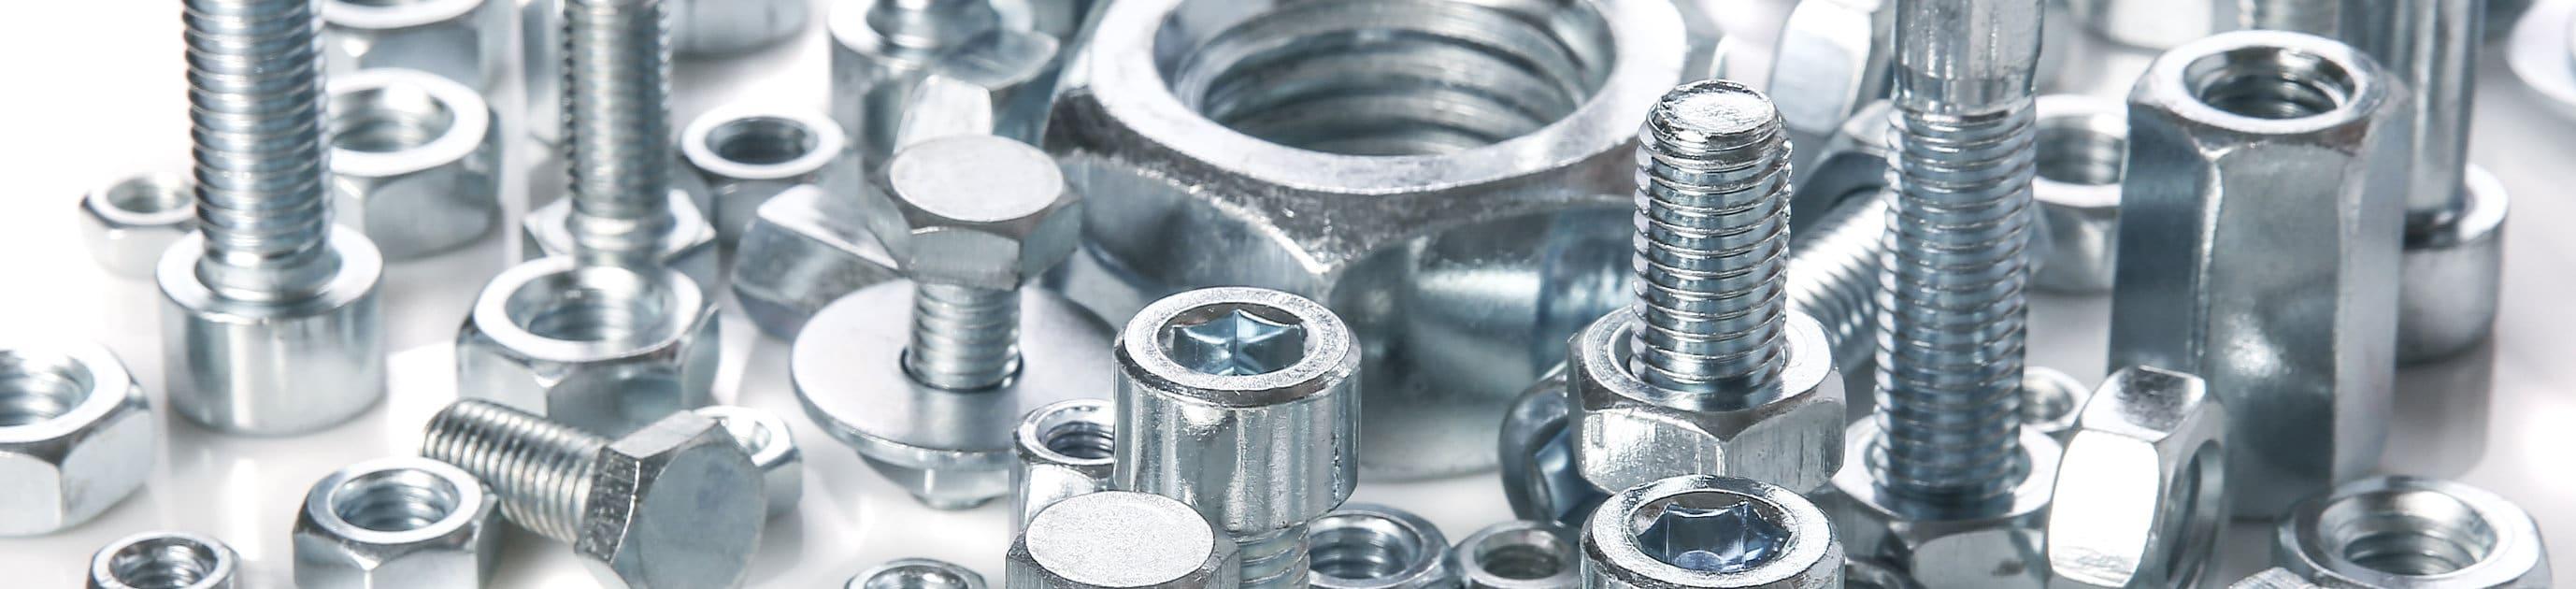 fasteners-fittings-bottom